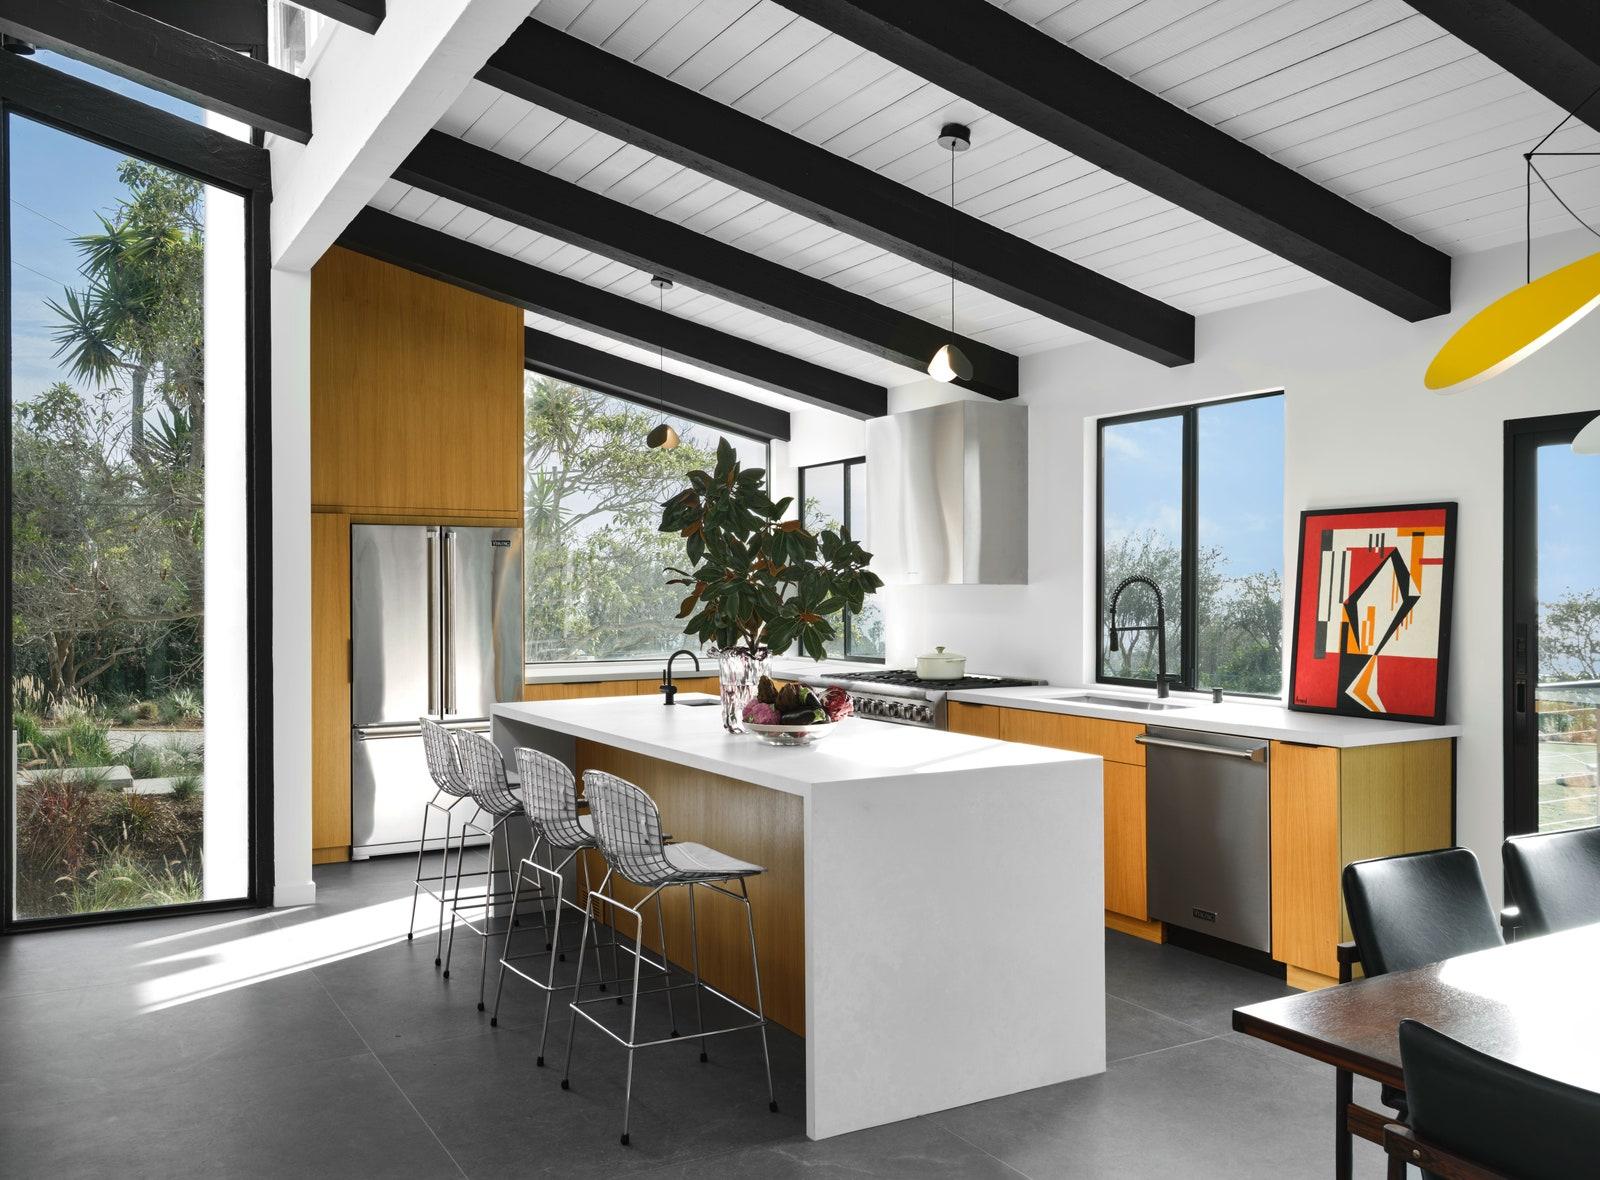 cozinha bancada ilha malibu reforma casa